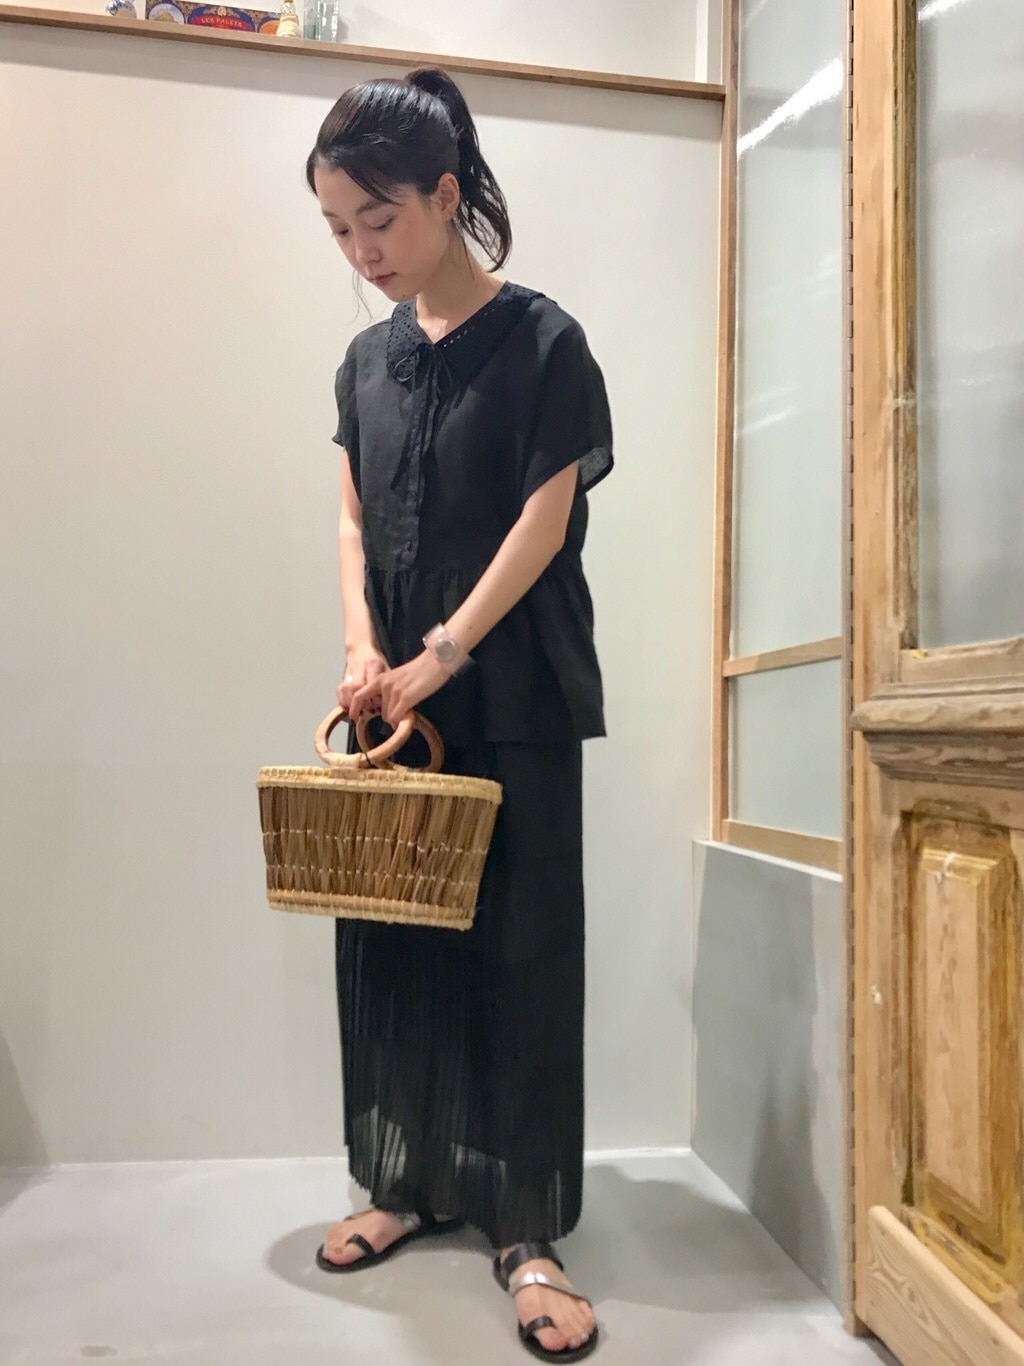 bulle de savon 渋谷スクランブルスクエア 身長:153cm 2020.08.19